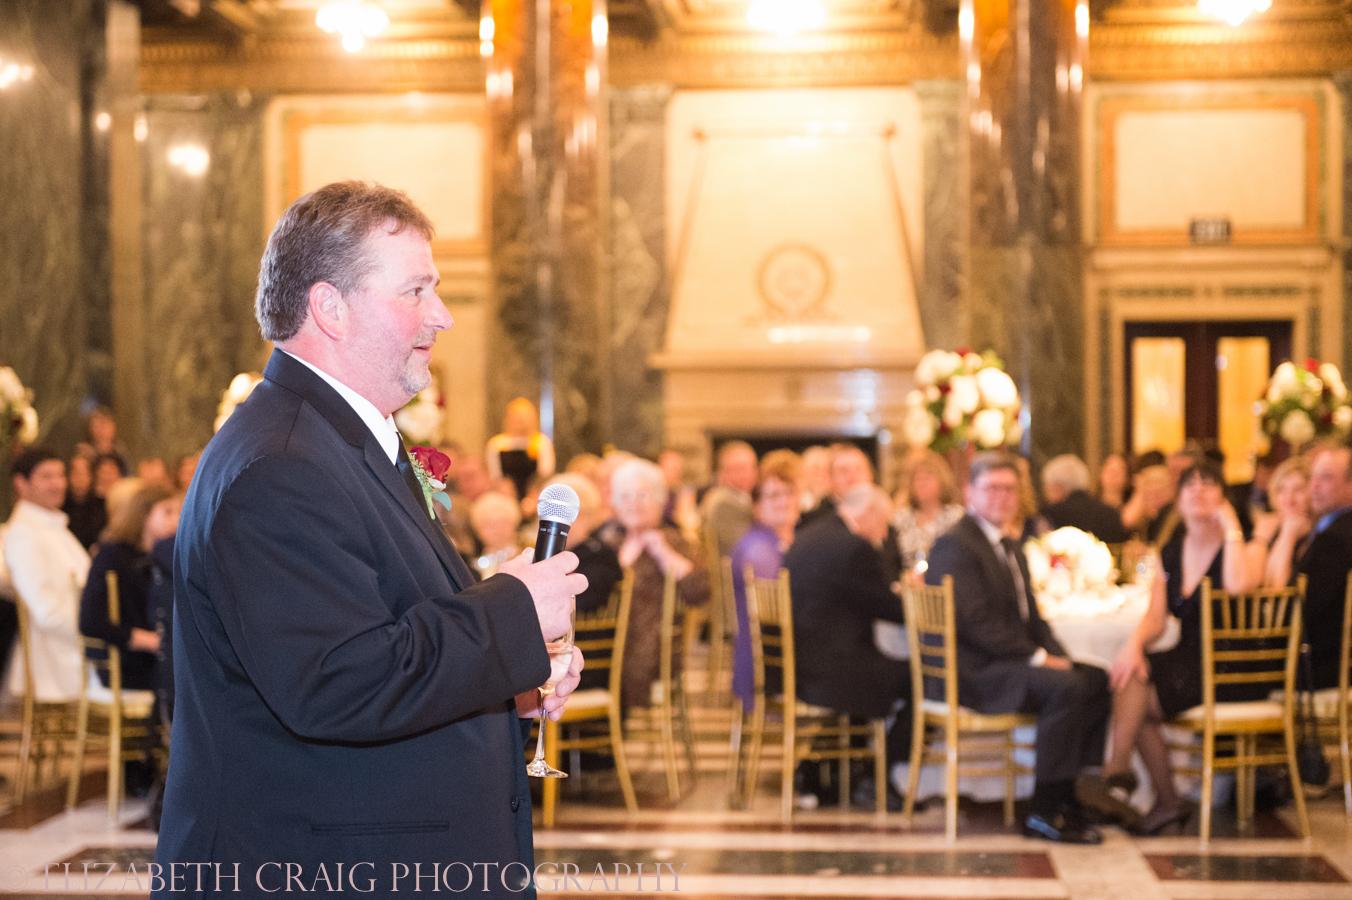 Carnegie Museum of Art Weddings | Elizabeth Craig Photography-0108